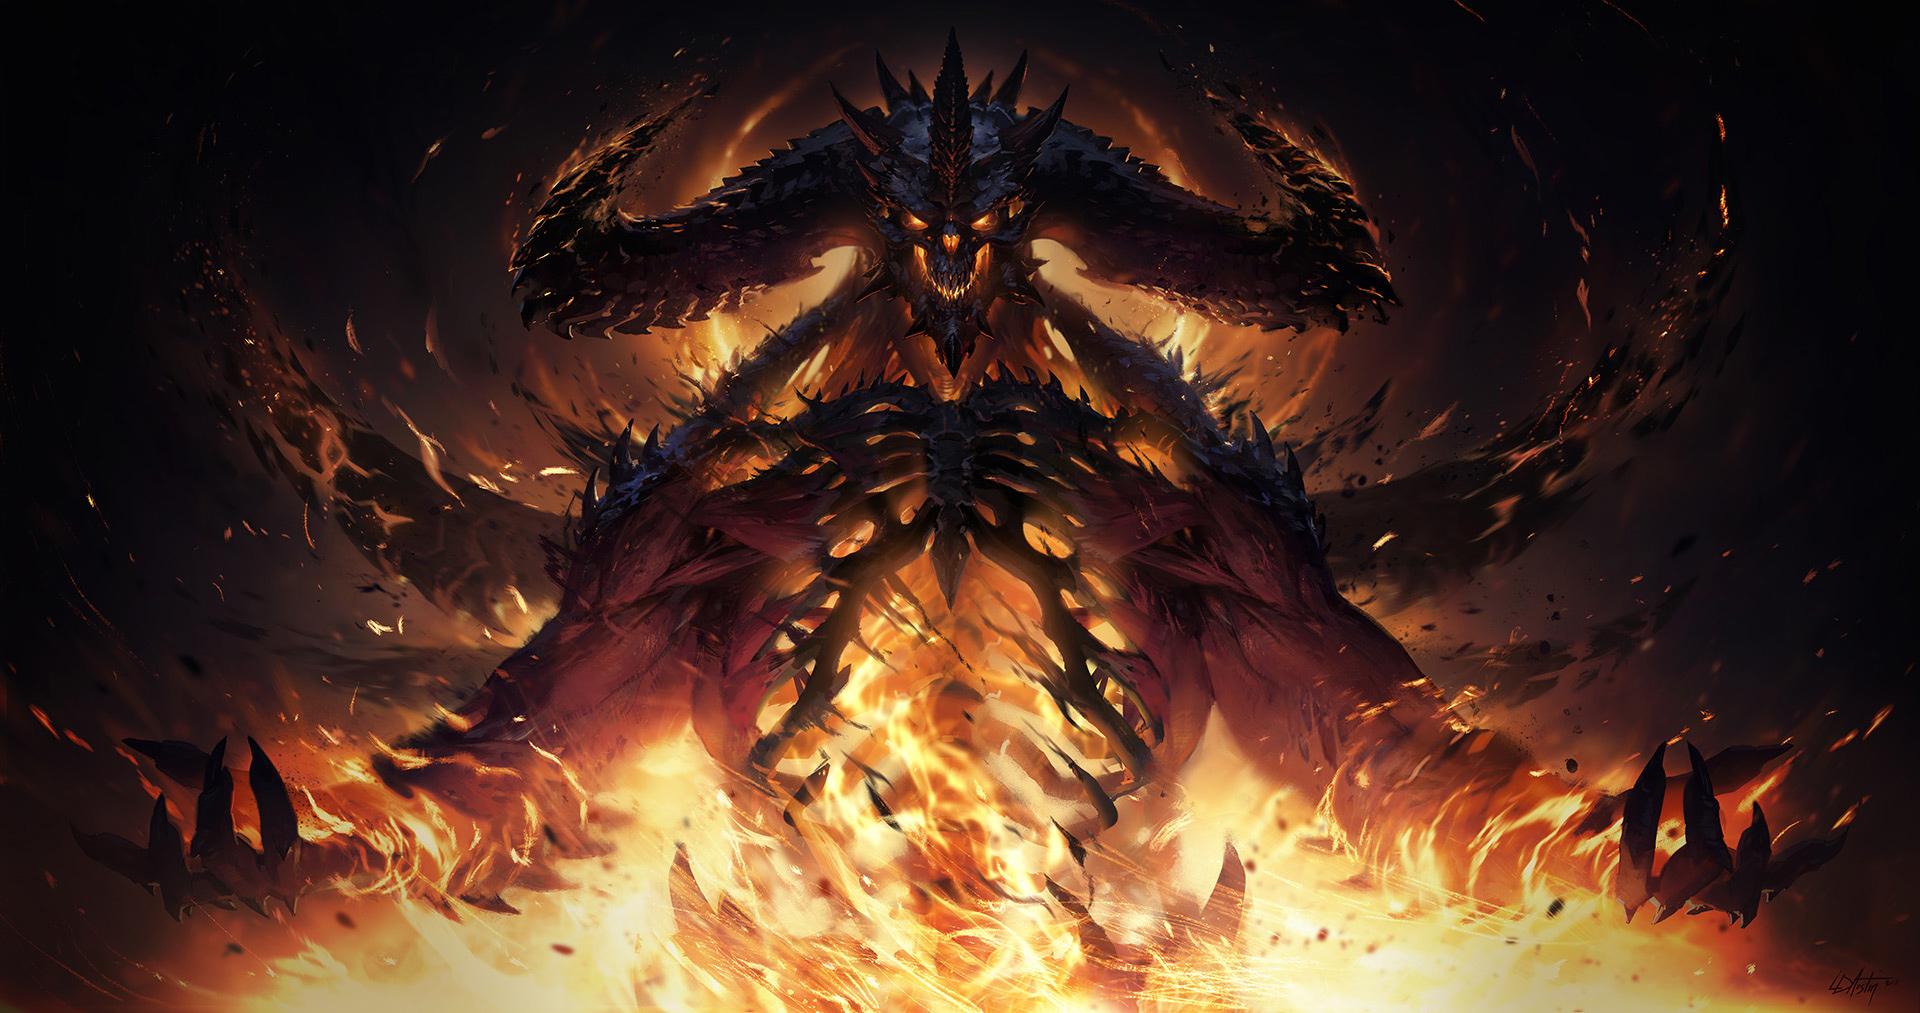 Diablo Immortal has a new trailer for ChinaJoy 2020